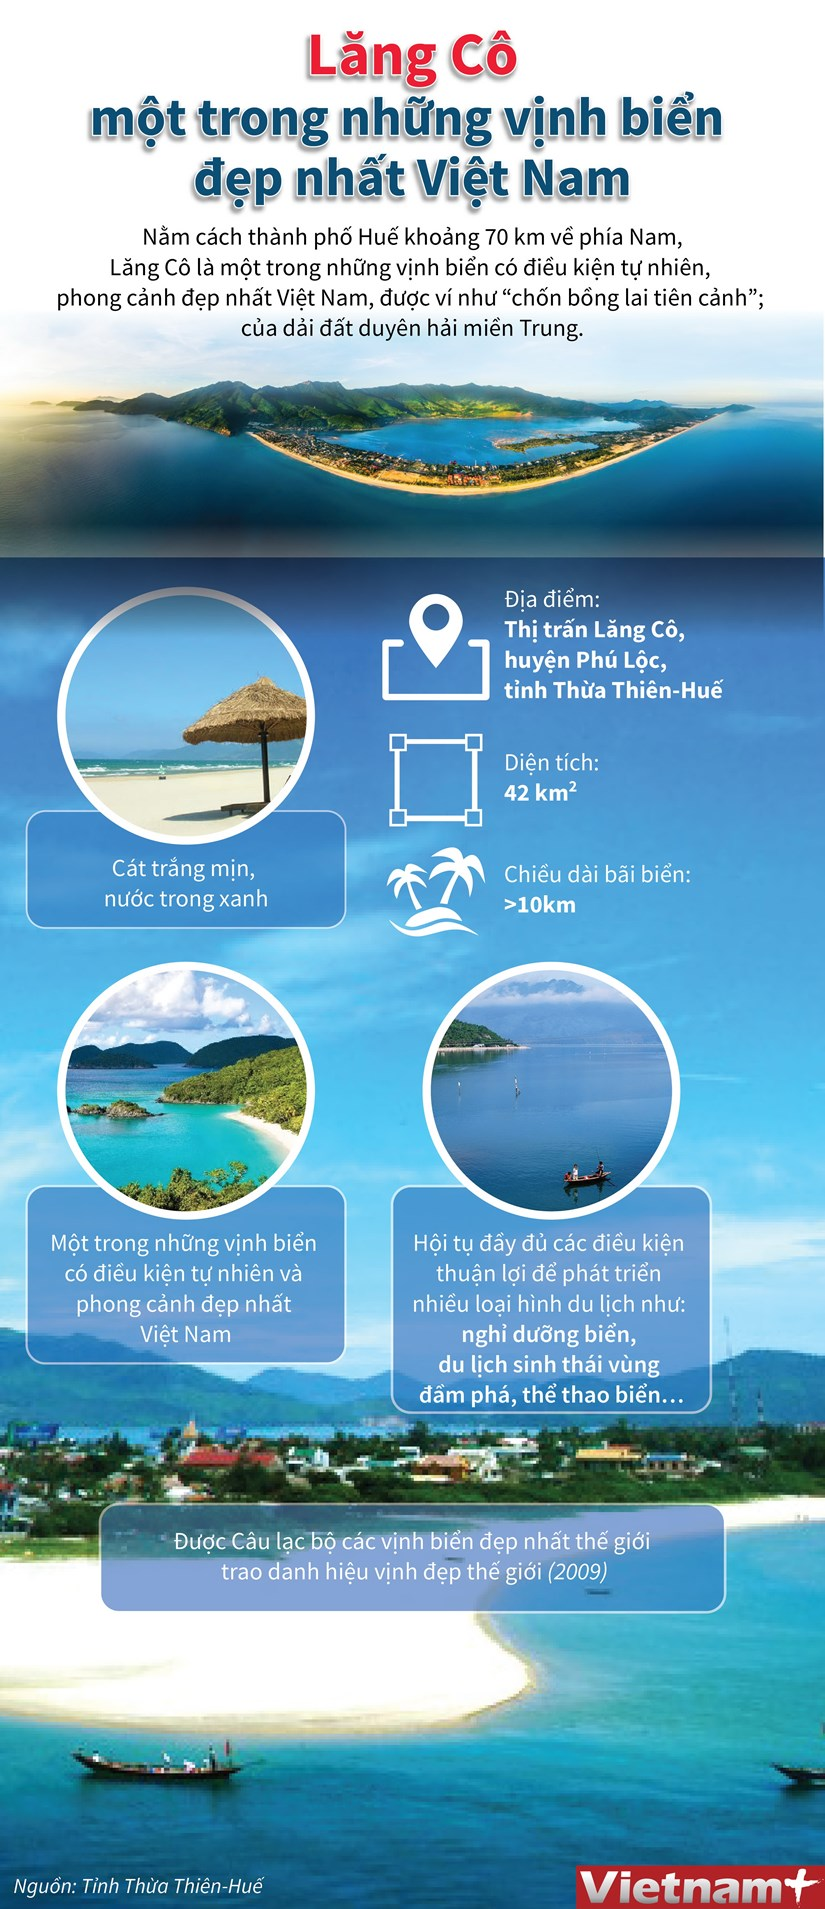 [Infographics] Lang Co - Mot trong nhung vinh bien dep nhat Viet Nam hinh anh 1